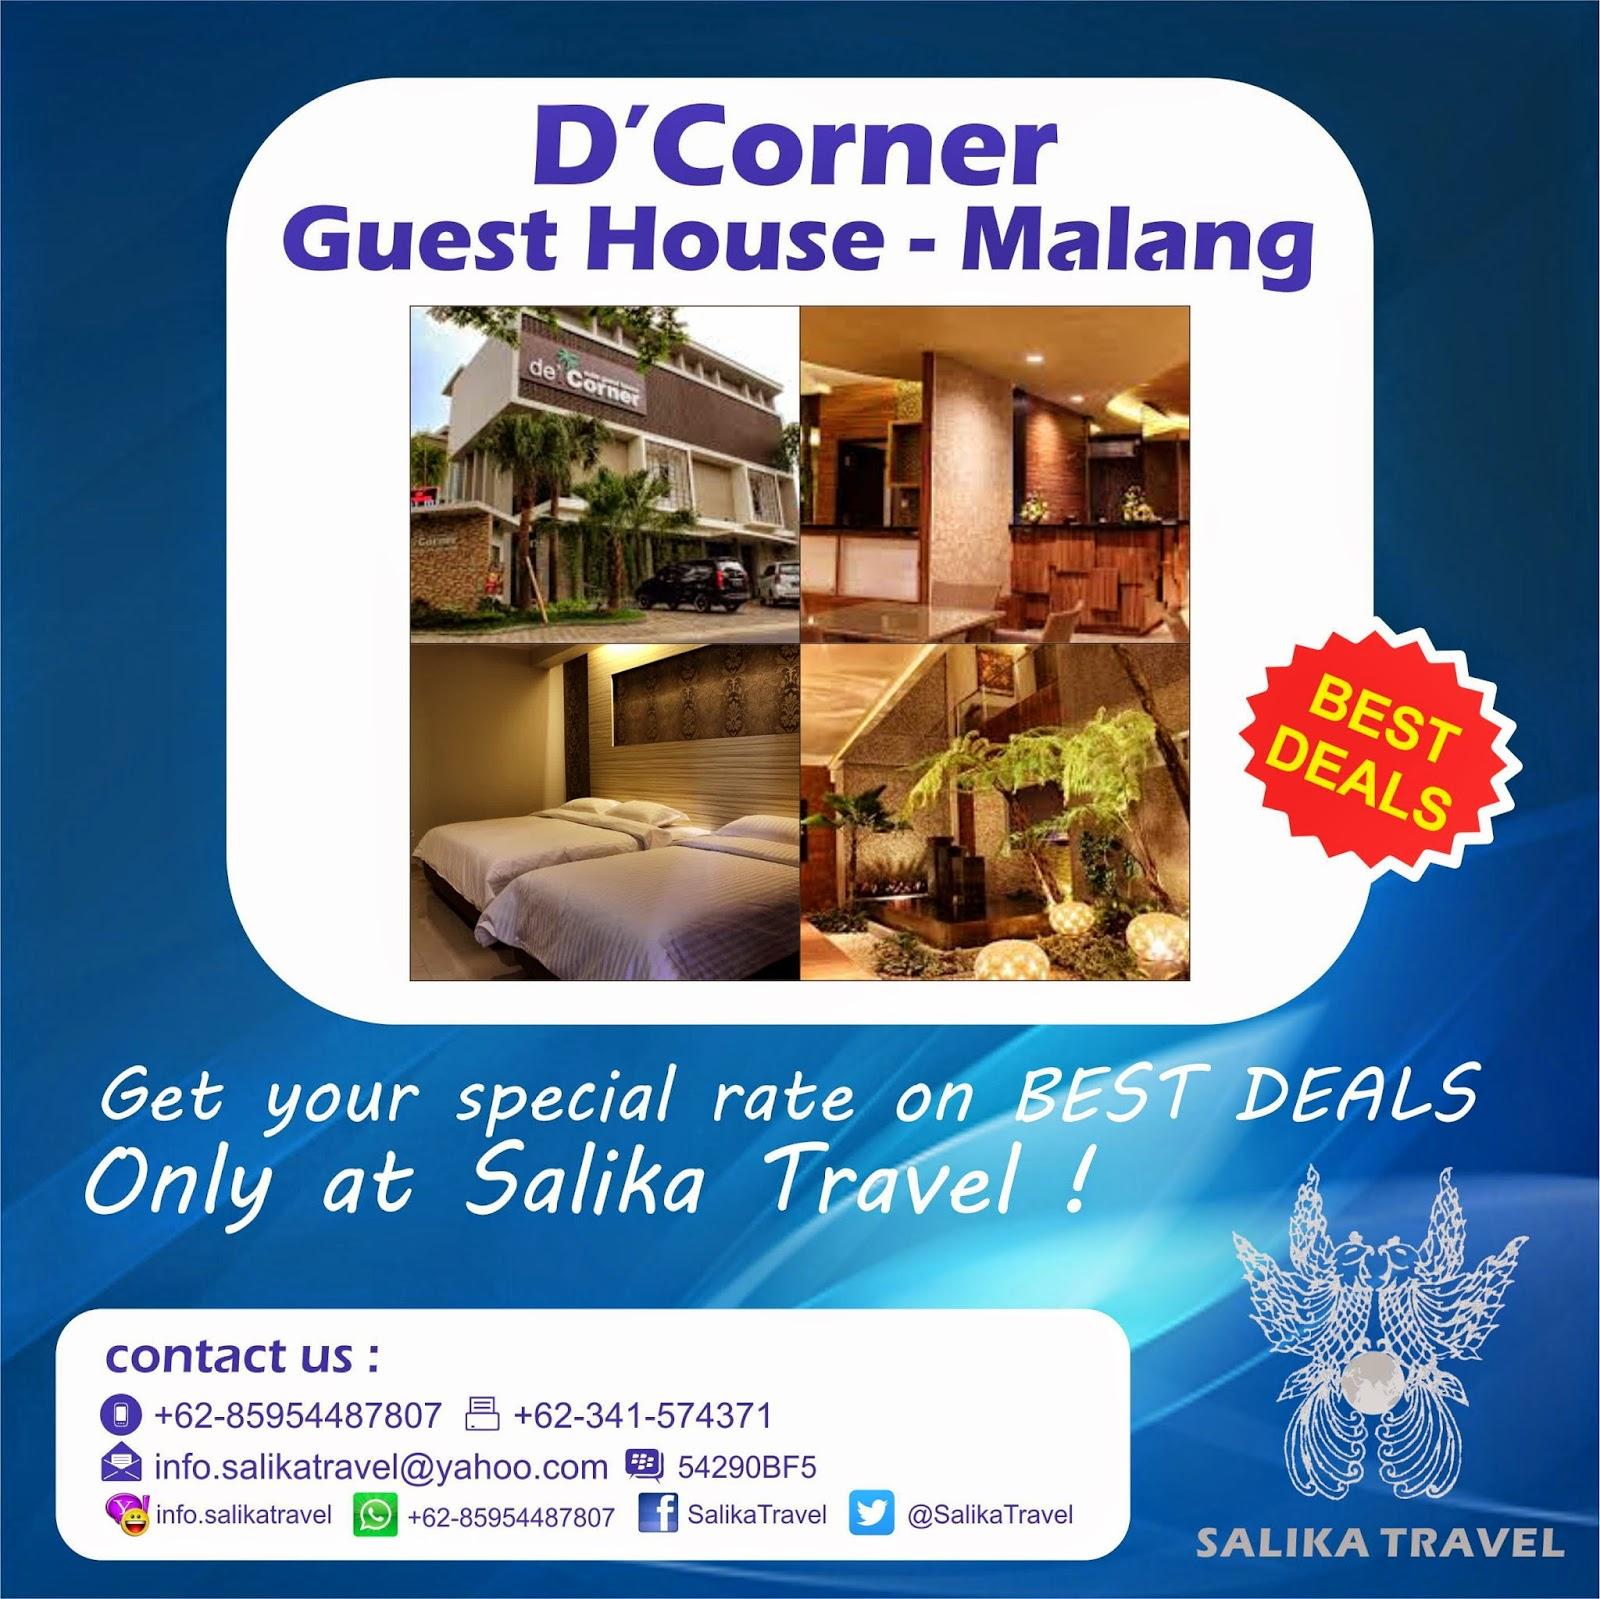 D'Corner Guest House Malang - Salika Travel